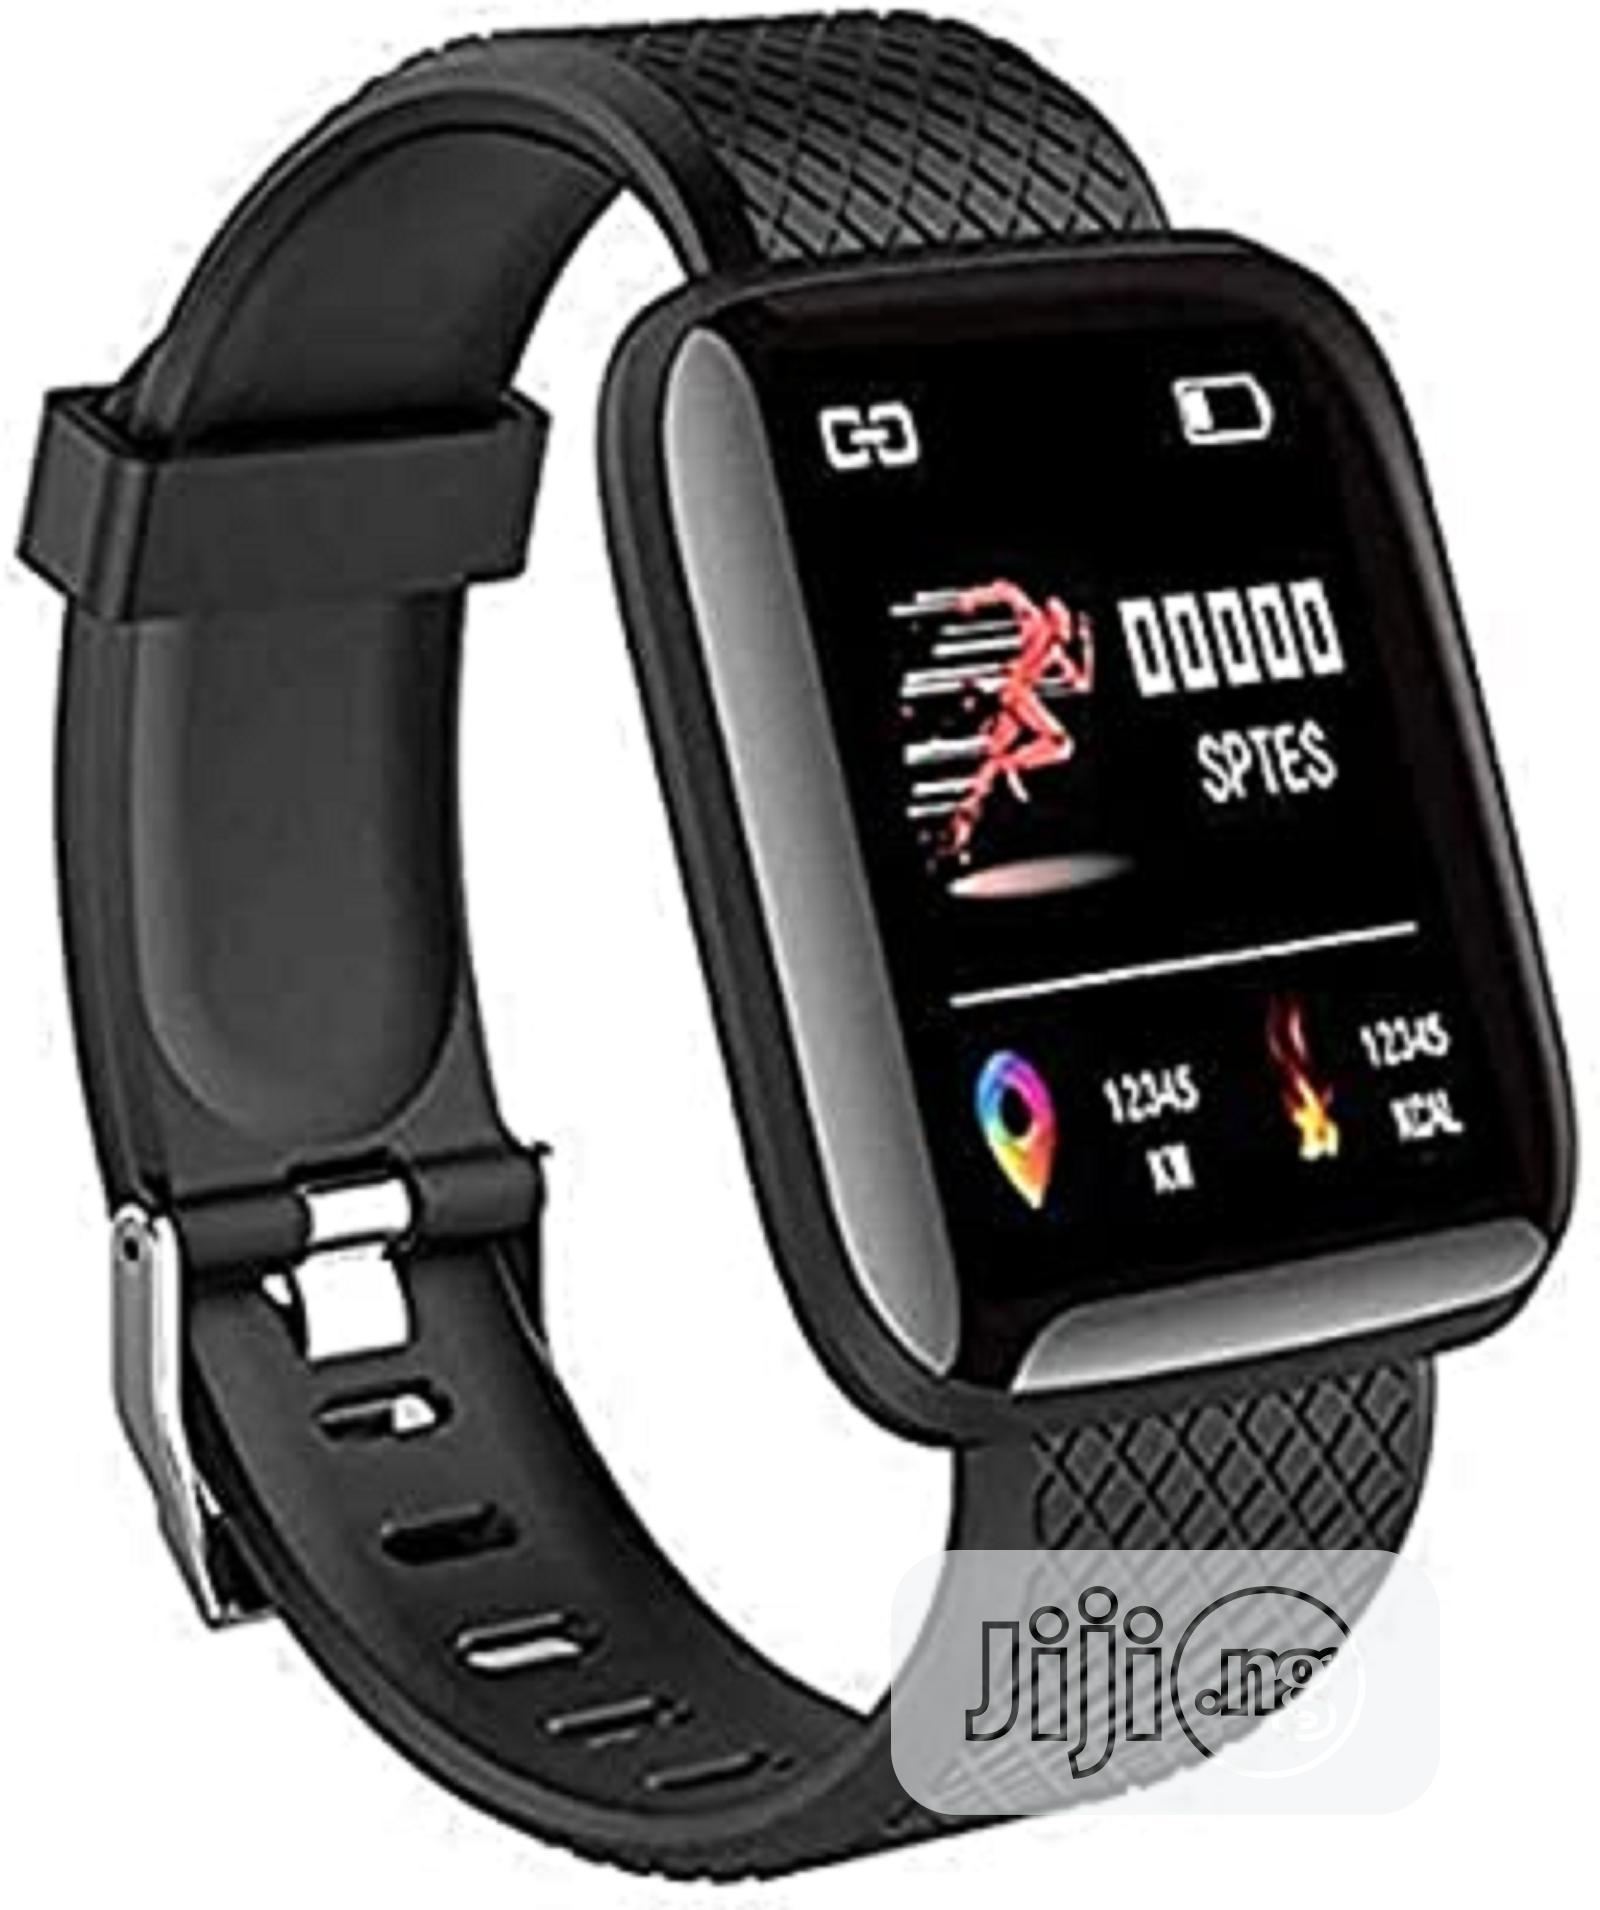 Smart 115p Bluetooth Fitness Smart Health Band Watch